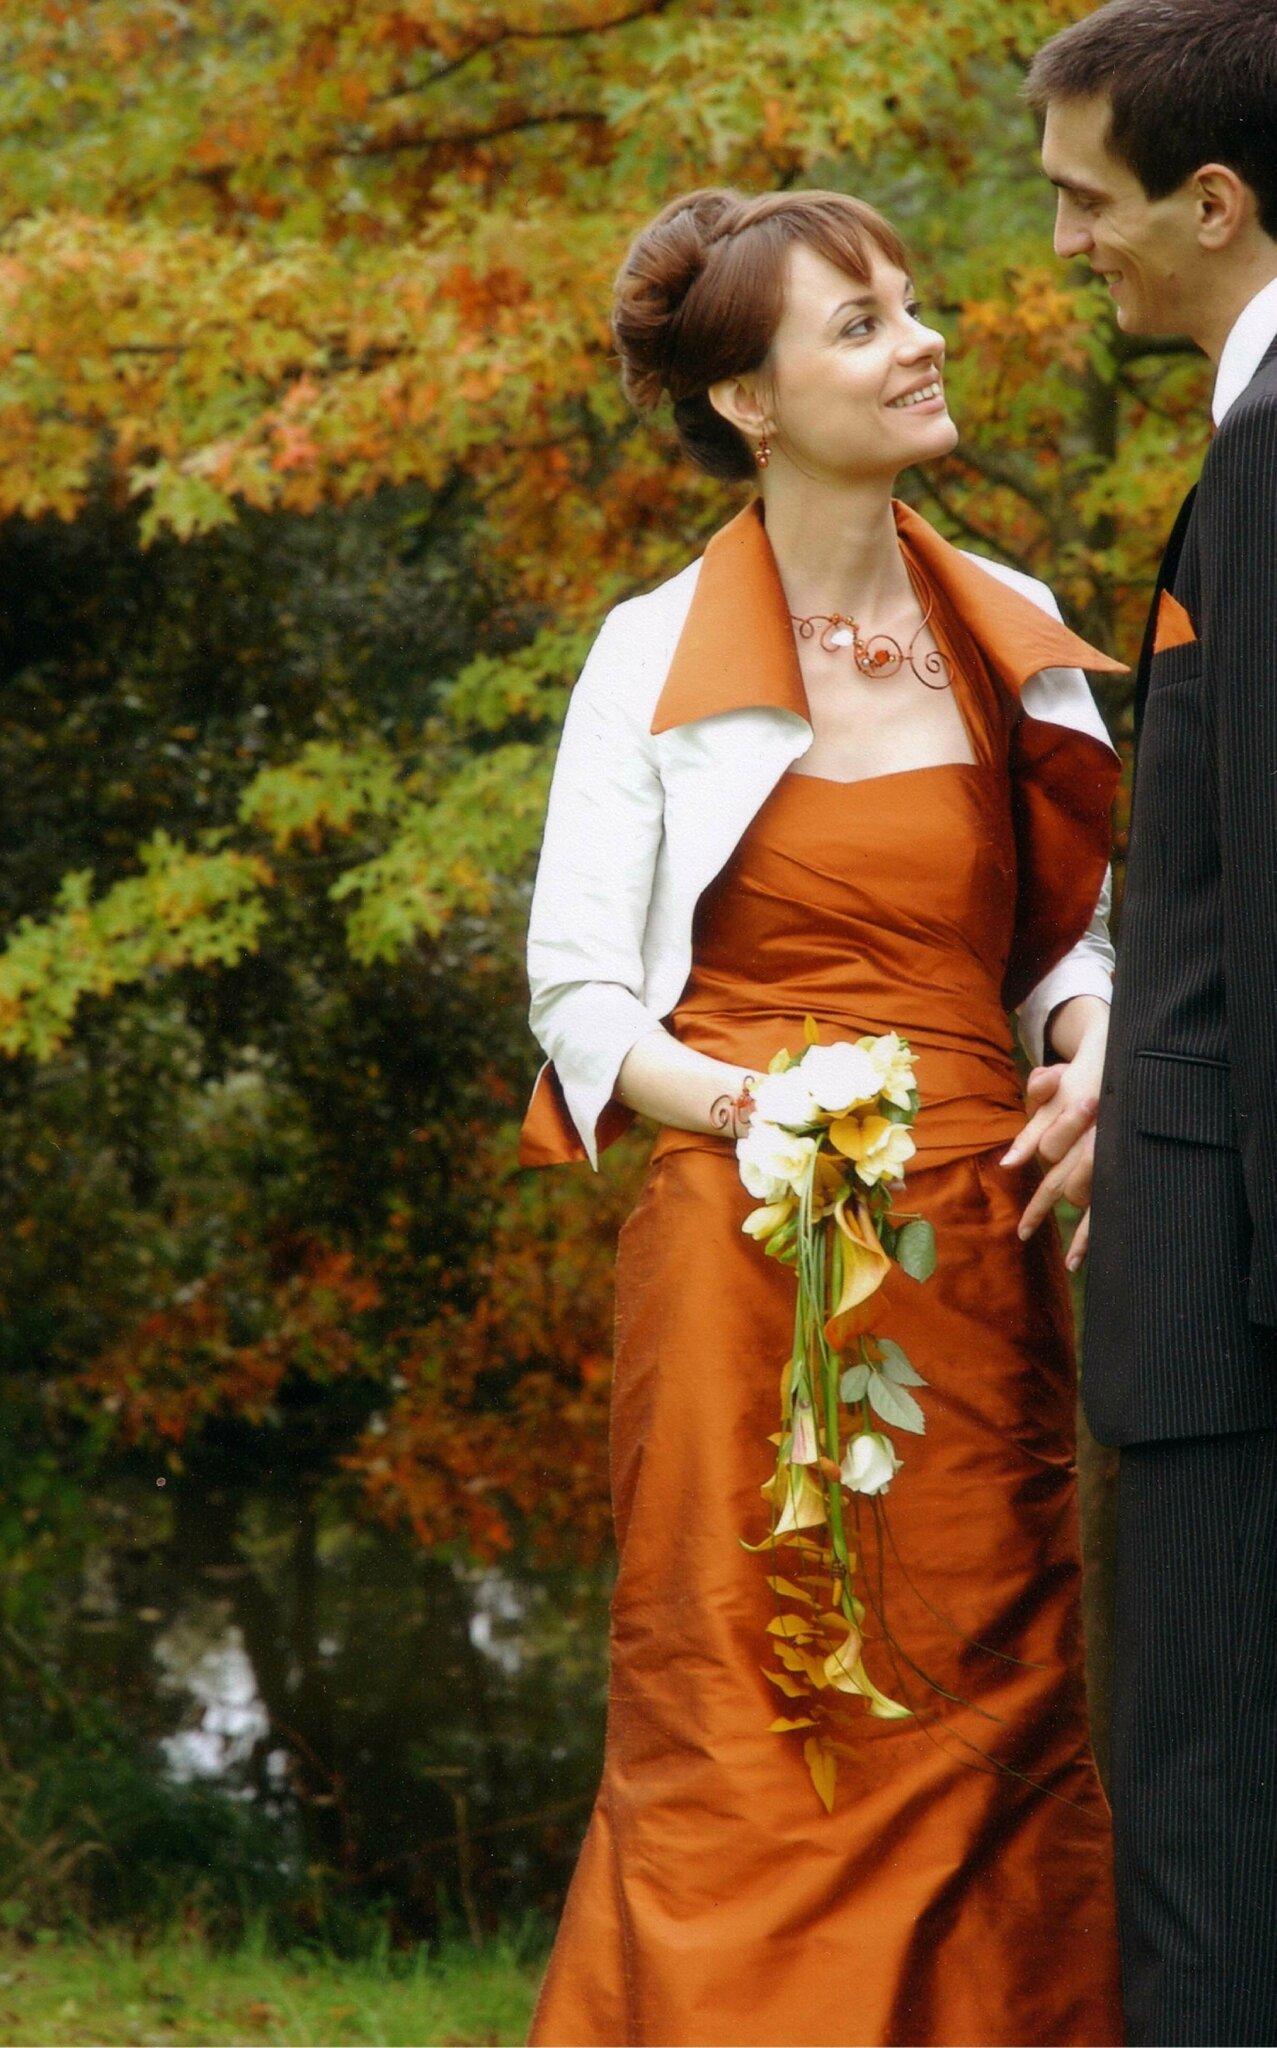 Mariage en automne robe de mari e orange bijoux volutes - Mariage couleur orange ...